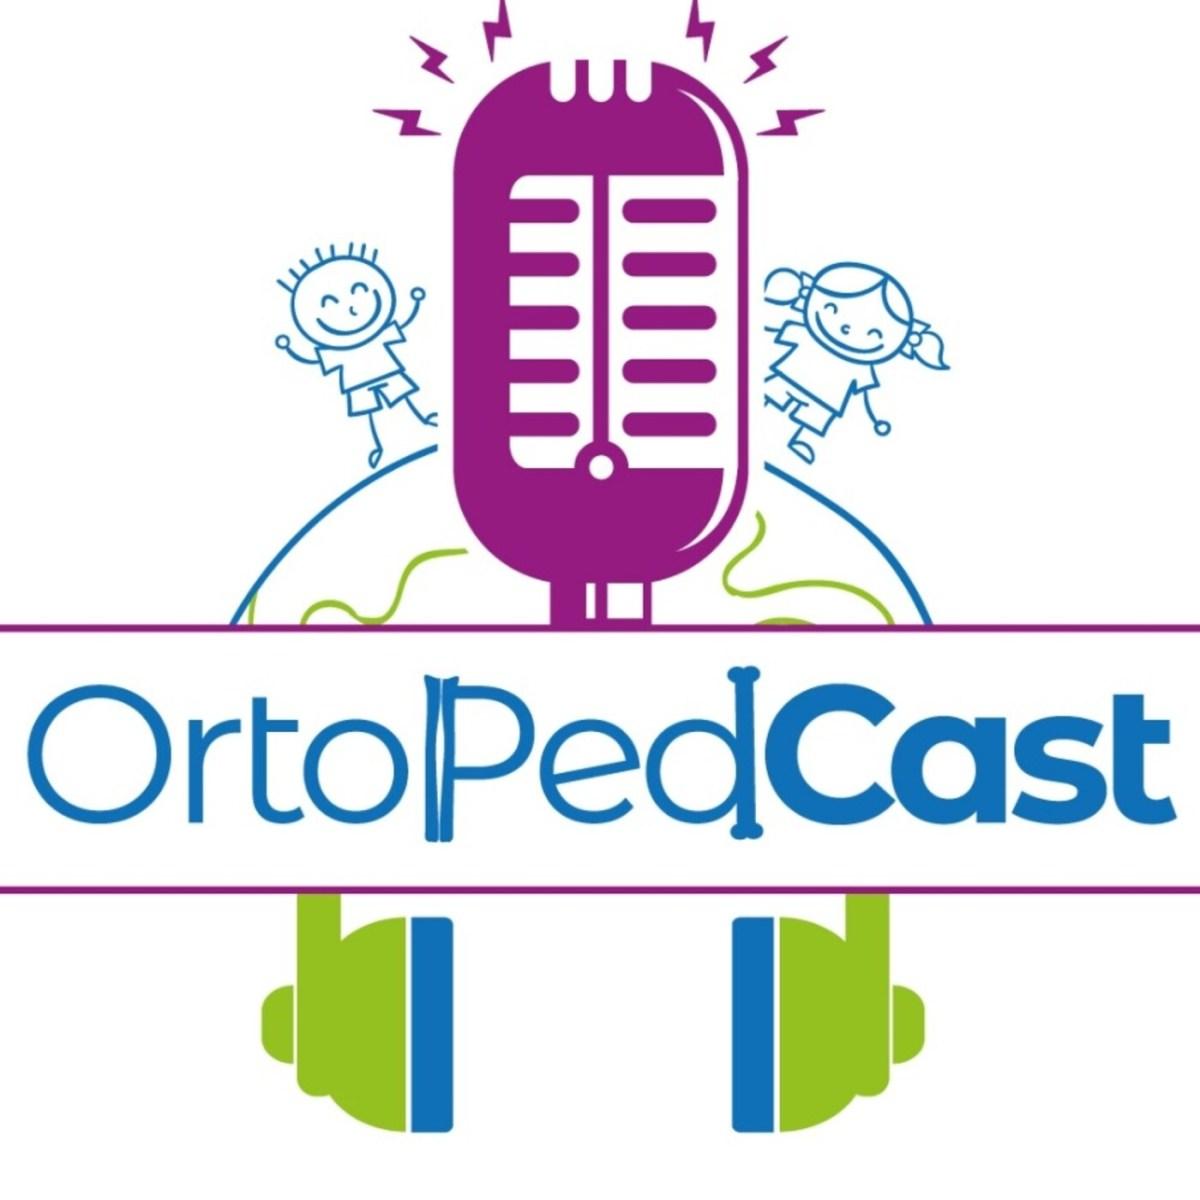 ¡Bienvenidos a OrtoPedCast!